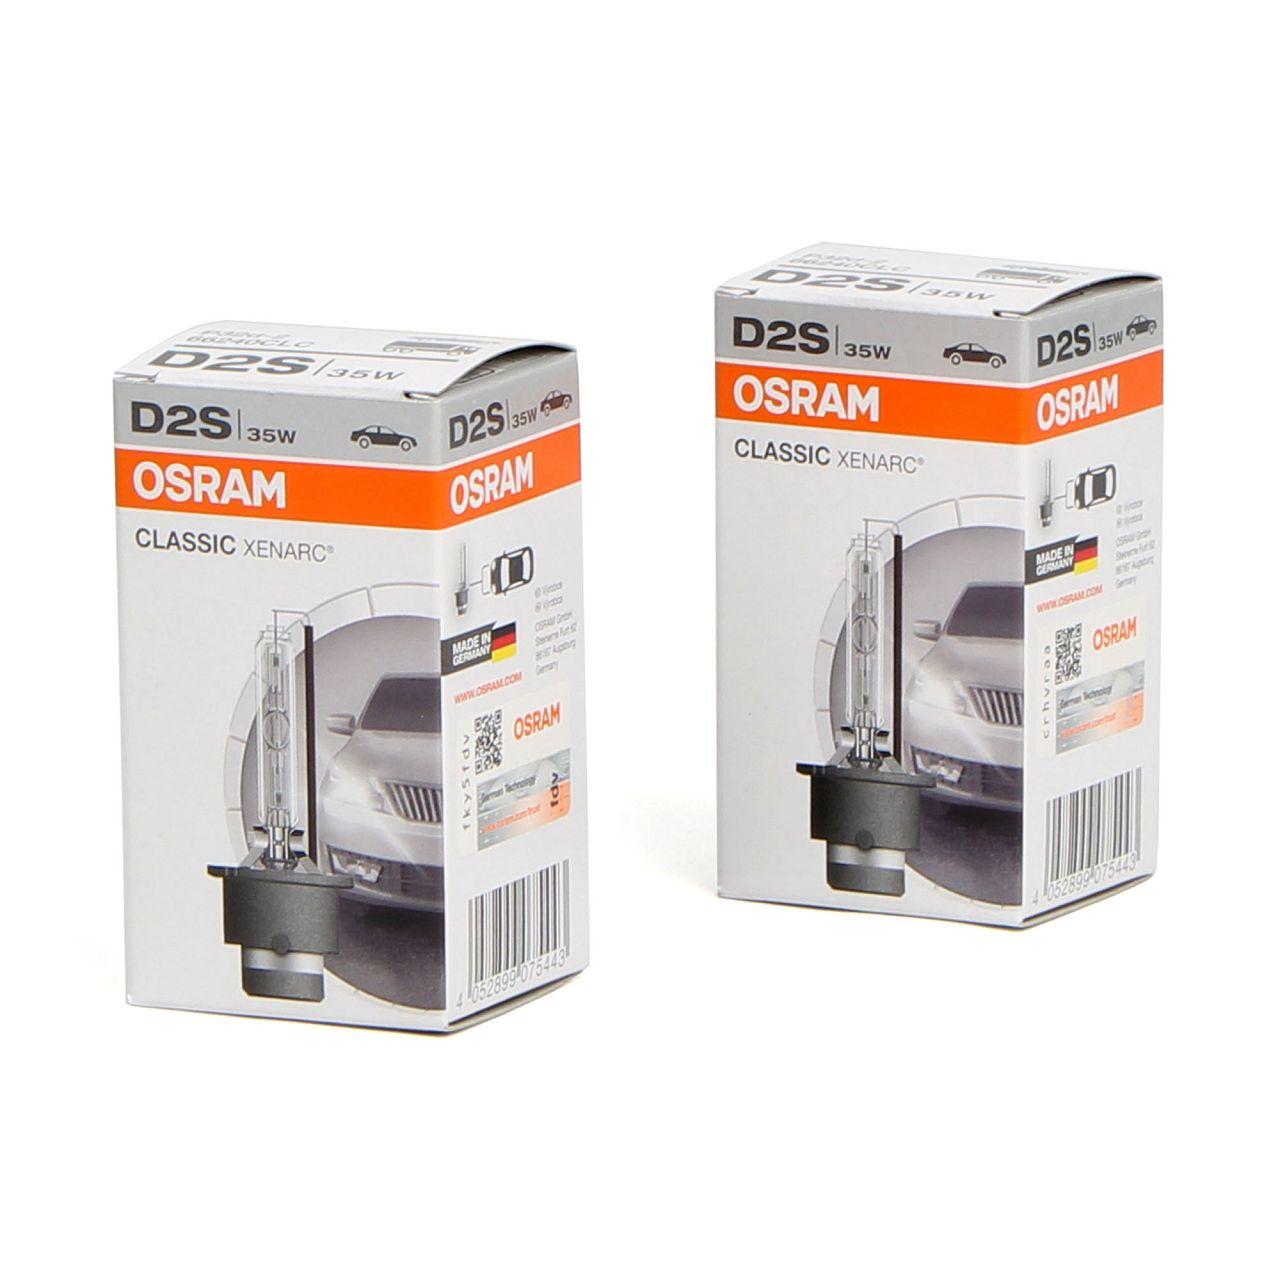 2x OSRAM 66240CLC Xenarc Xenon Brenner Lampe Scheinwerfer D2S CLASSIC 85V 35W